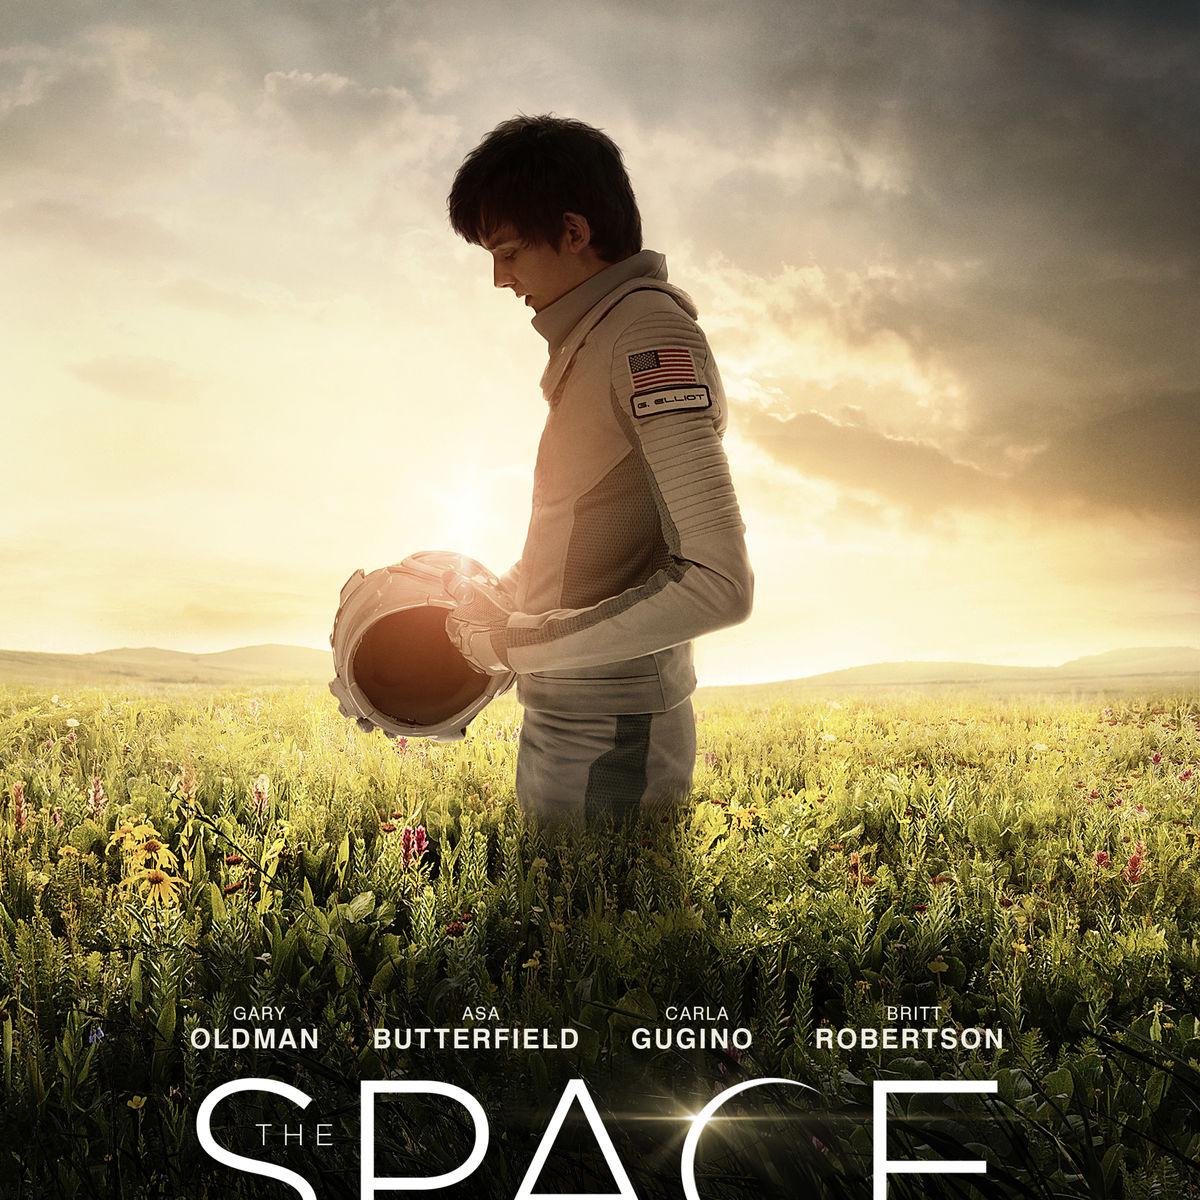 the-space-between-us-poster.jpg